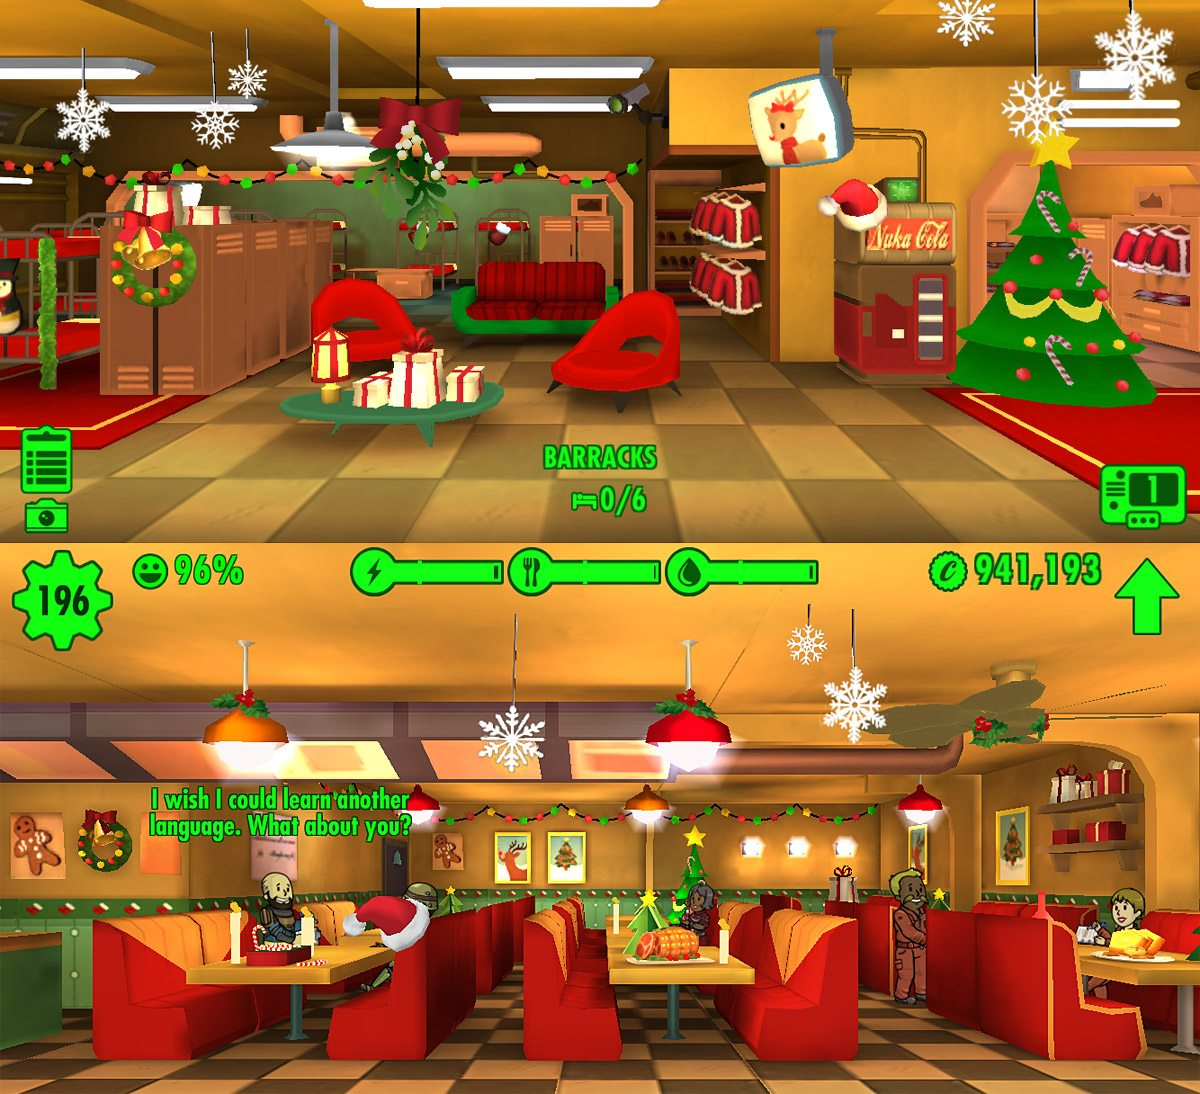 Commuter Gamer: A Merry 'Fallout Shelter' Christmas - GeekDad